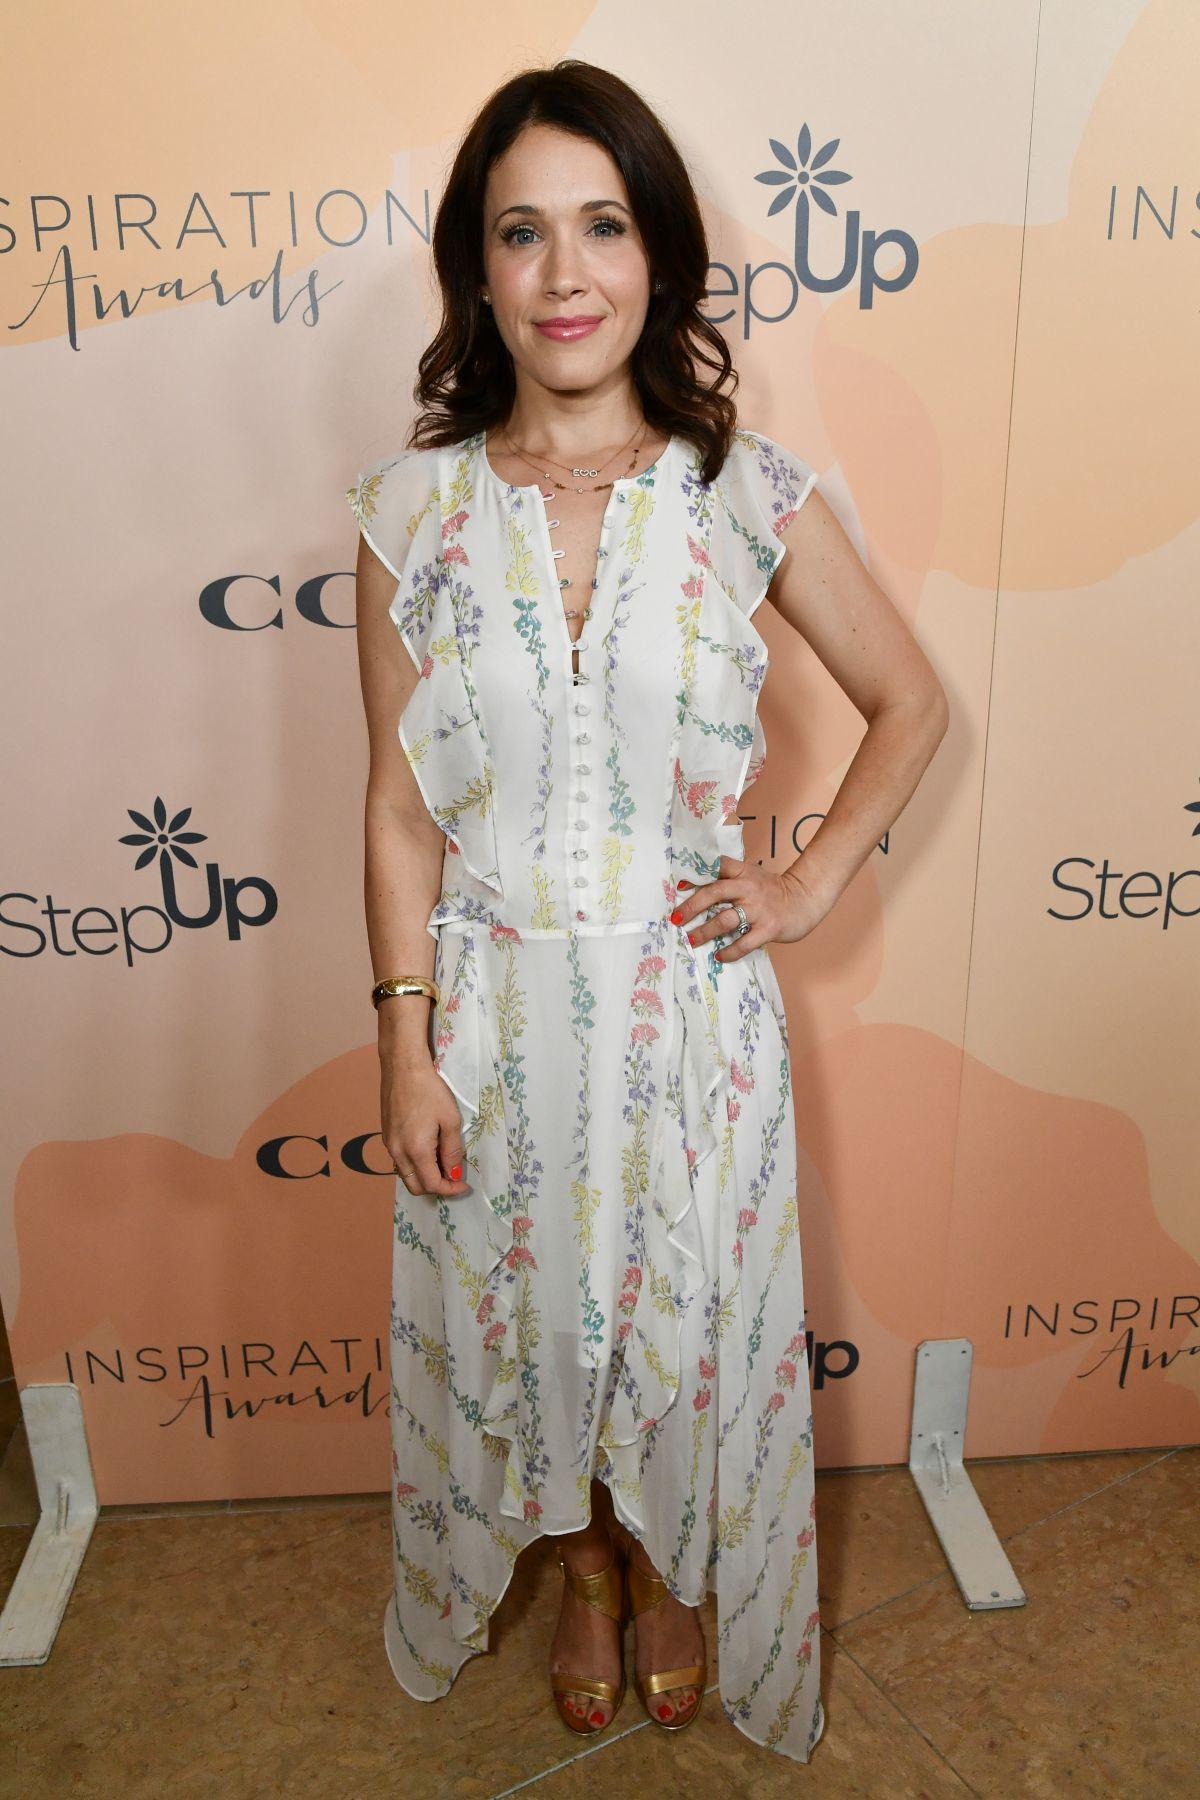 MARLA SOKOLOFF at Inspiration Awards in Los Angeles 06/02/2017